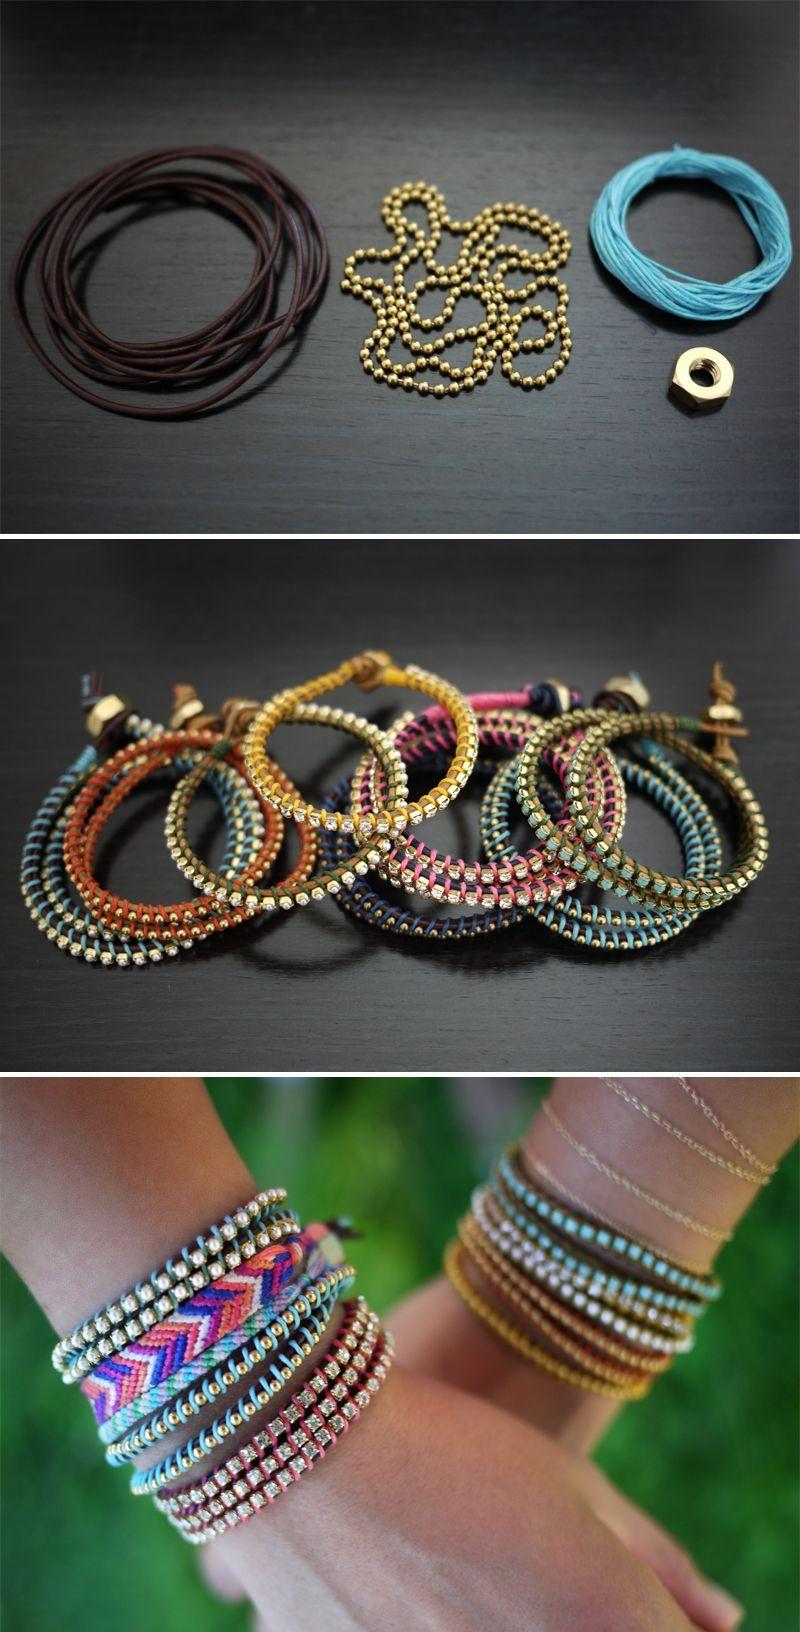 Diy Wrap Bracelet Wraps Bracelets And Craft